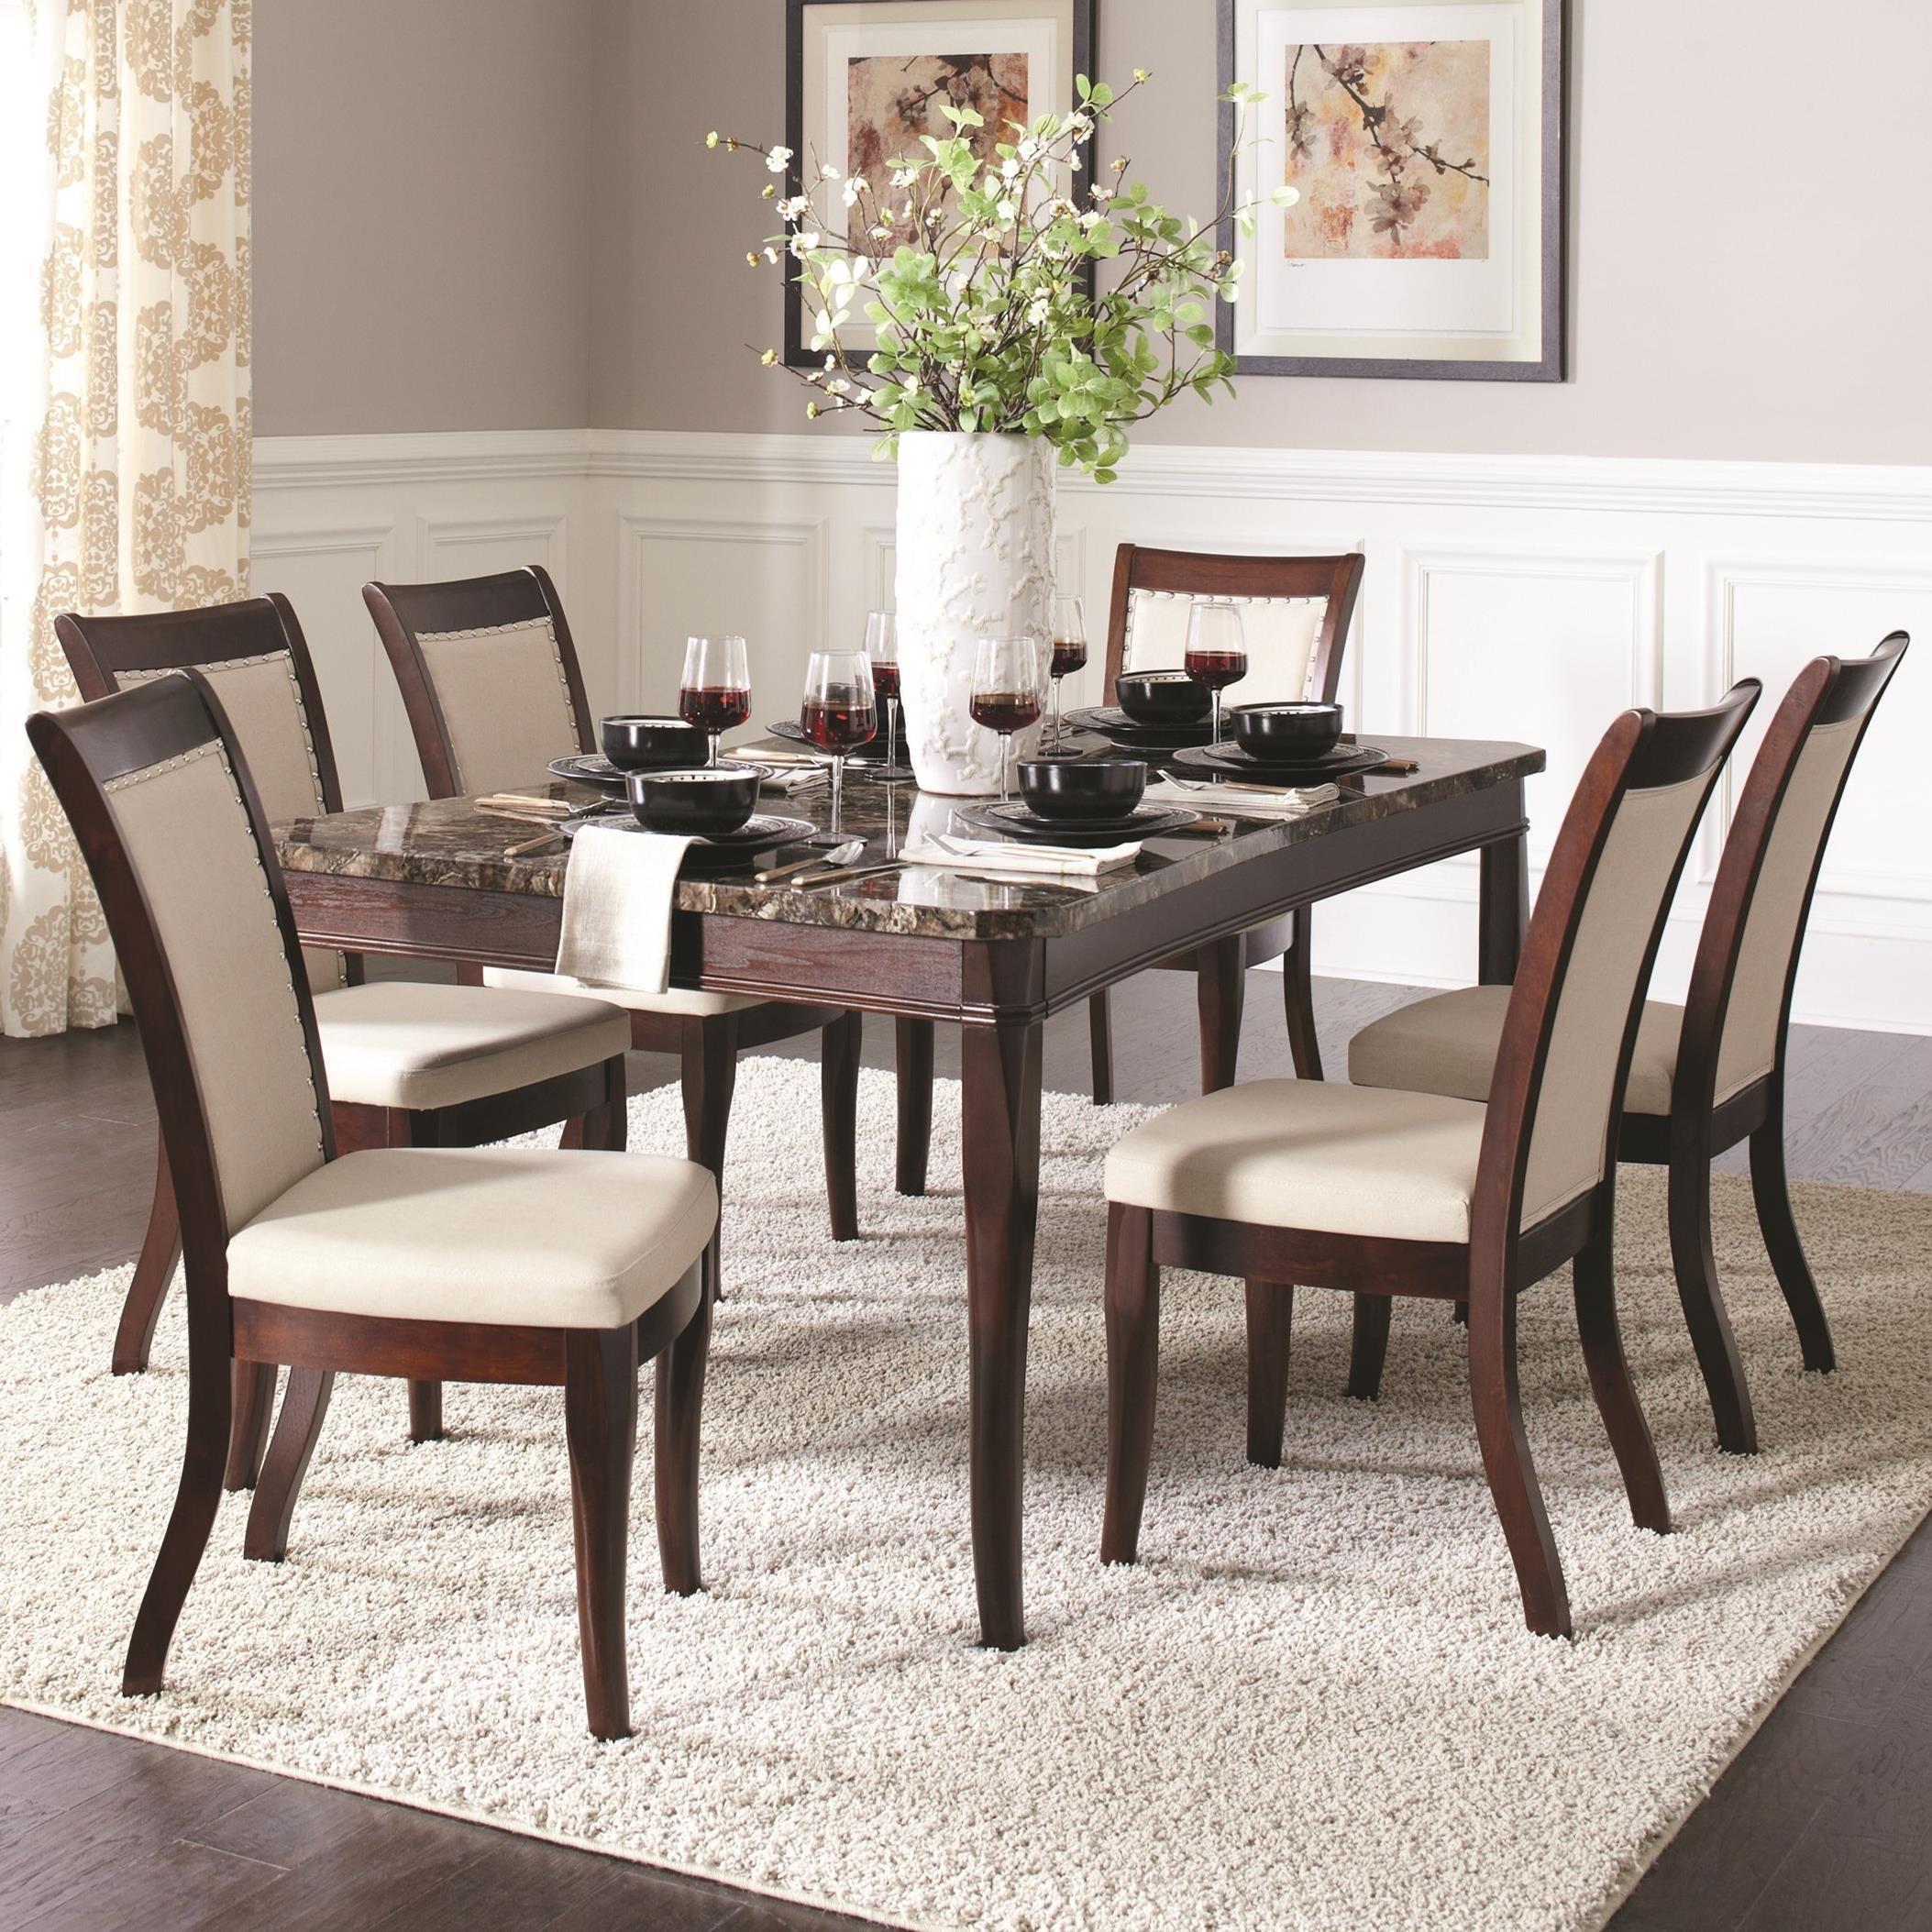 Delightful Coaster Cornett 7 Piece Dining Set | Dunk U0026 Bright Furniture | Dining 7 (or  More) Piece Sets